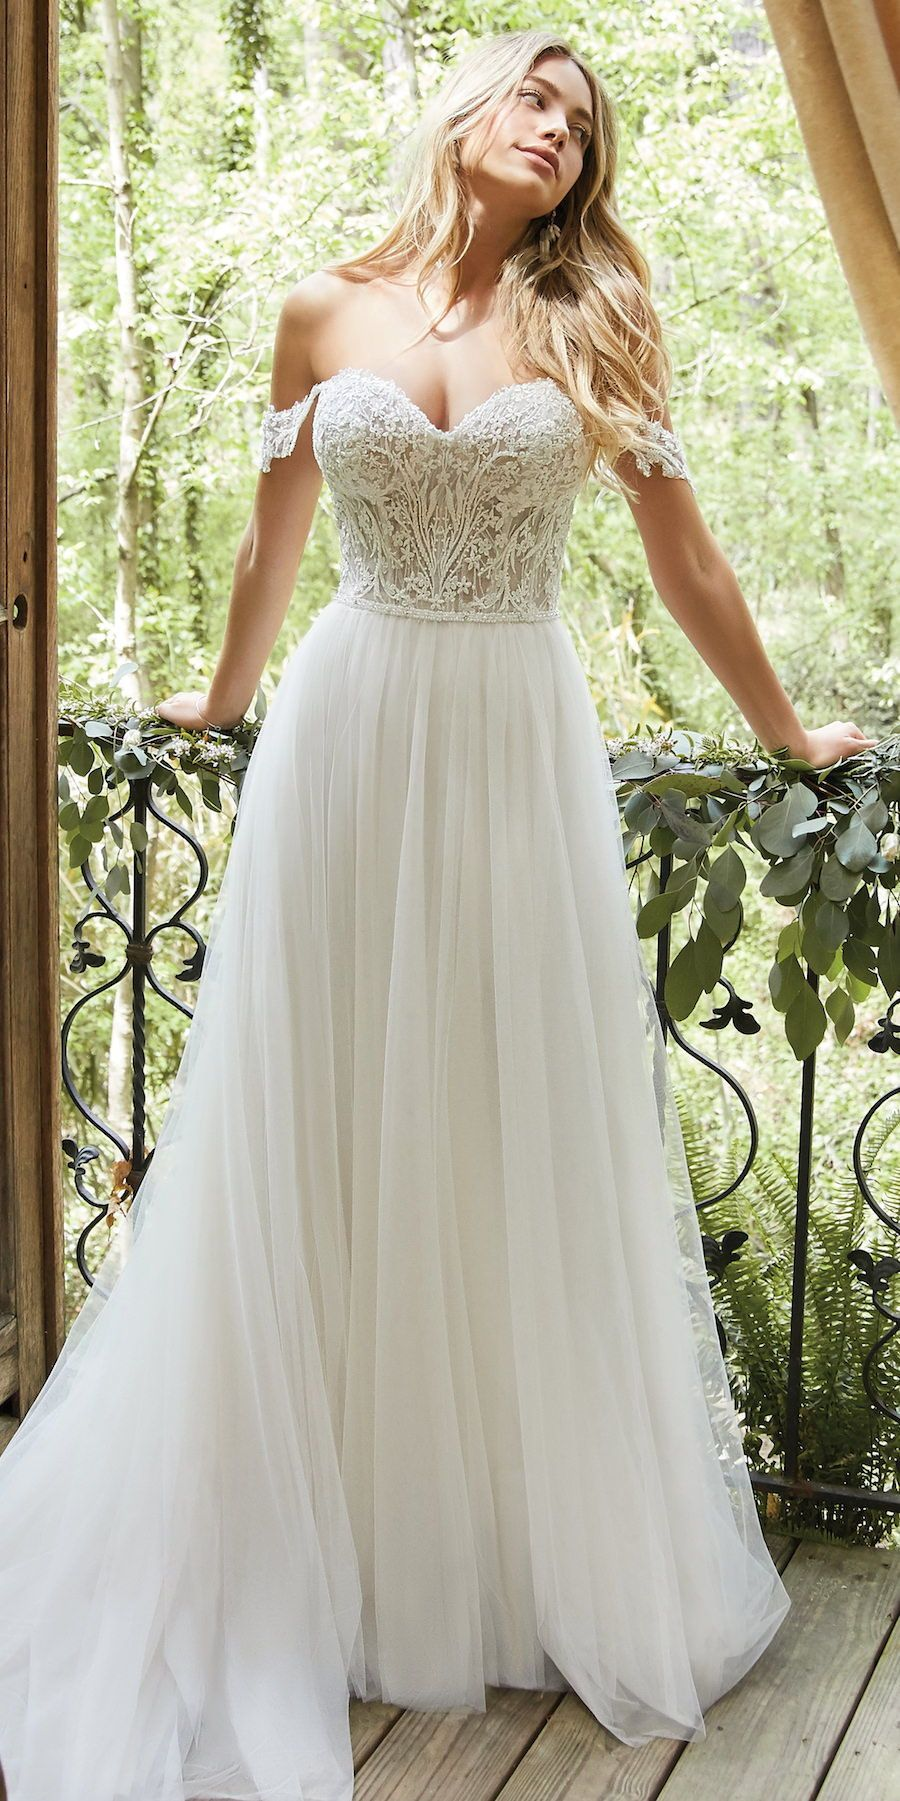 Wedding Dresses Lace Red A Line Wedding Dress By Rebecca Ingram Nia Beautiful Sheer Em In 2020 Wedding Dresses Beaded Tulle Skirt Wedding Dress Bodice Wedding Dress